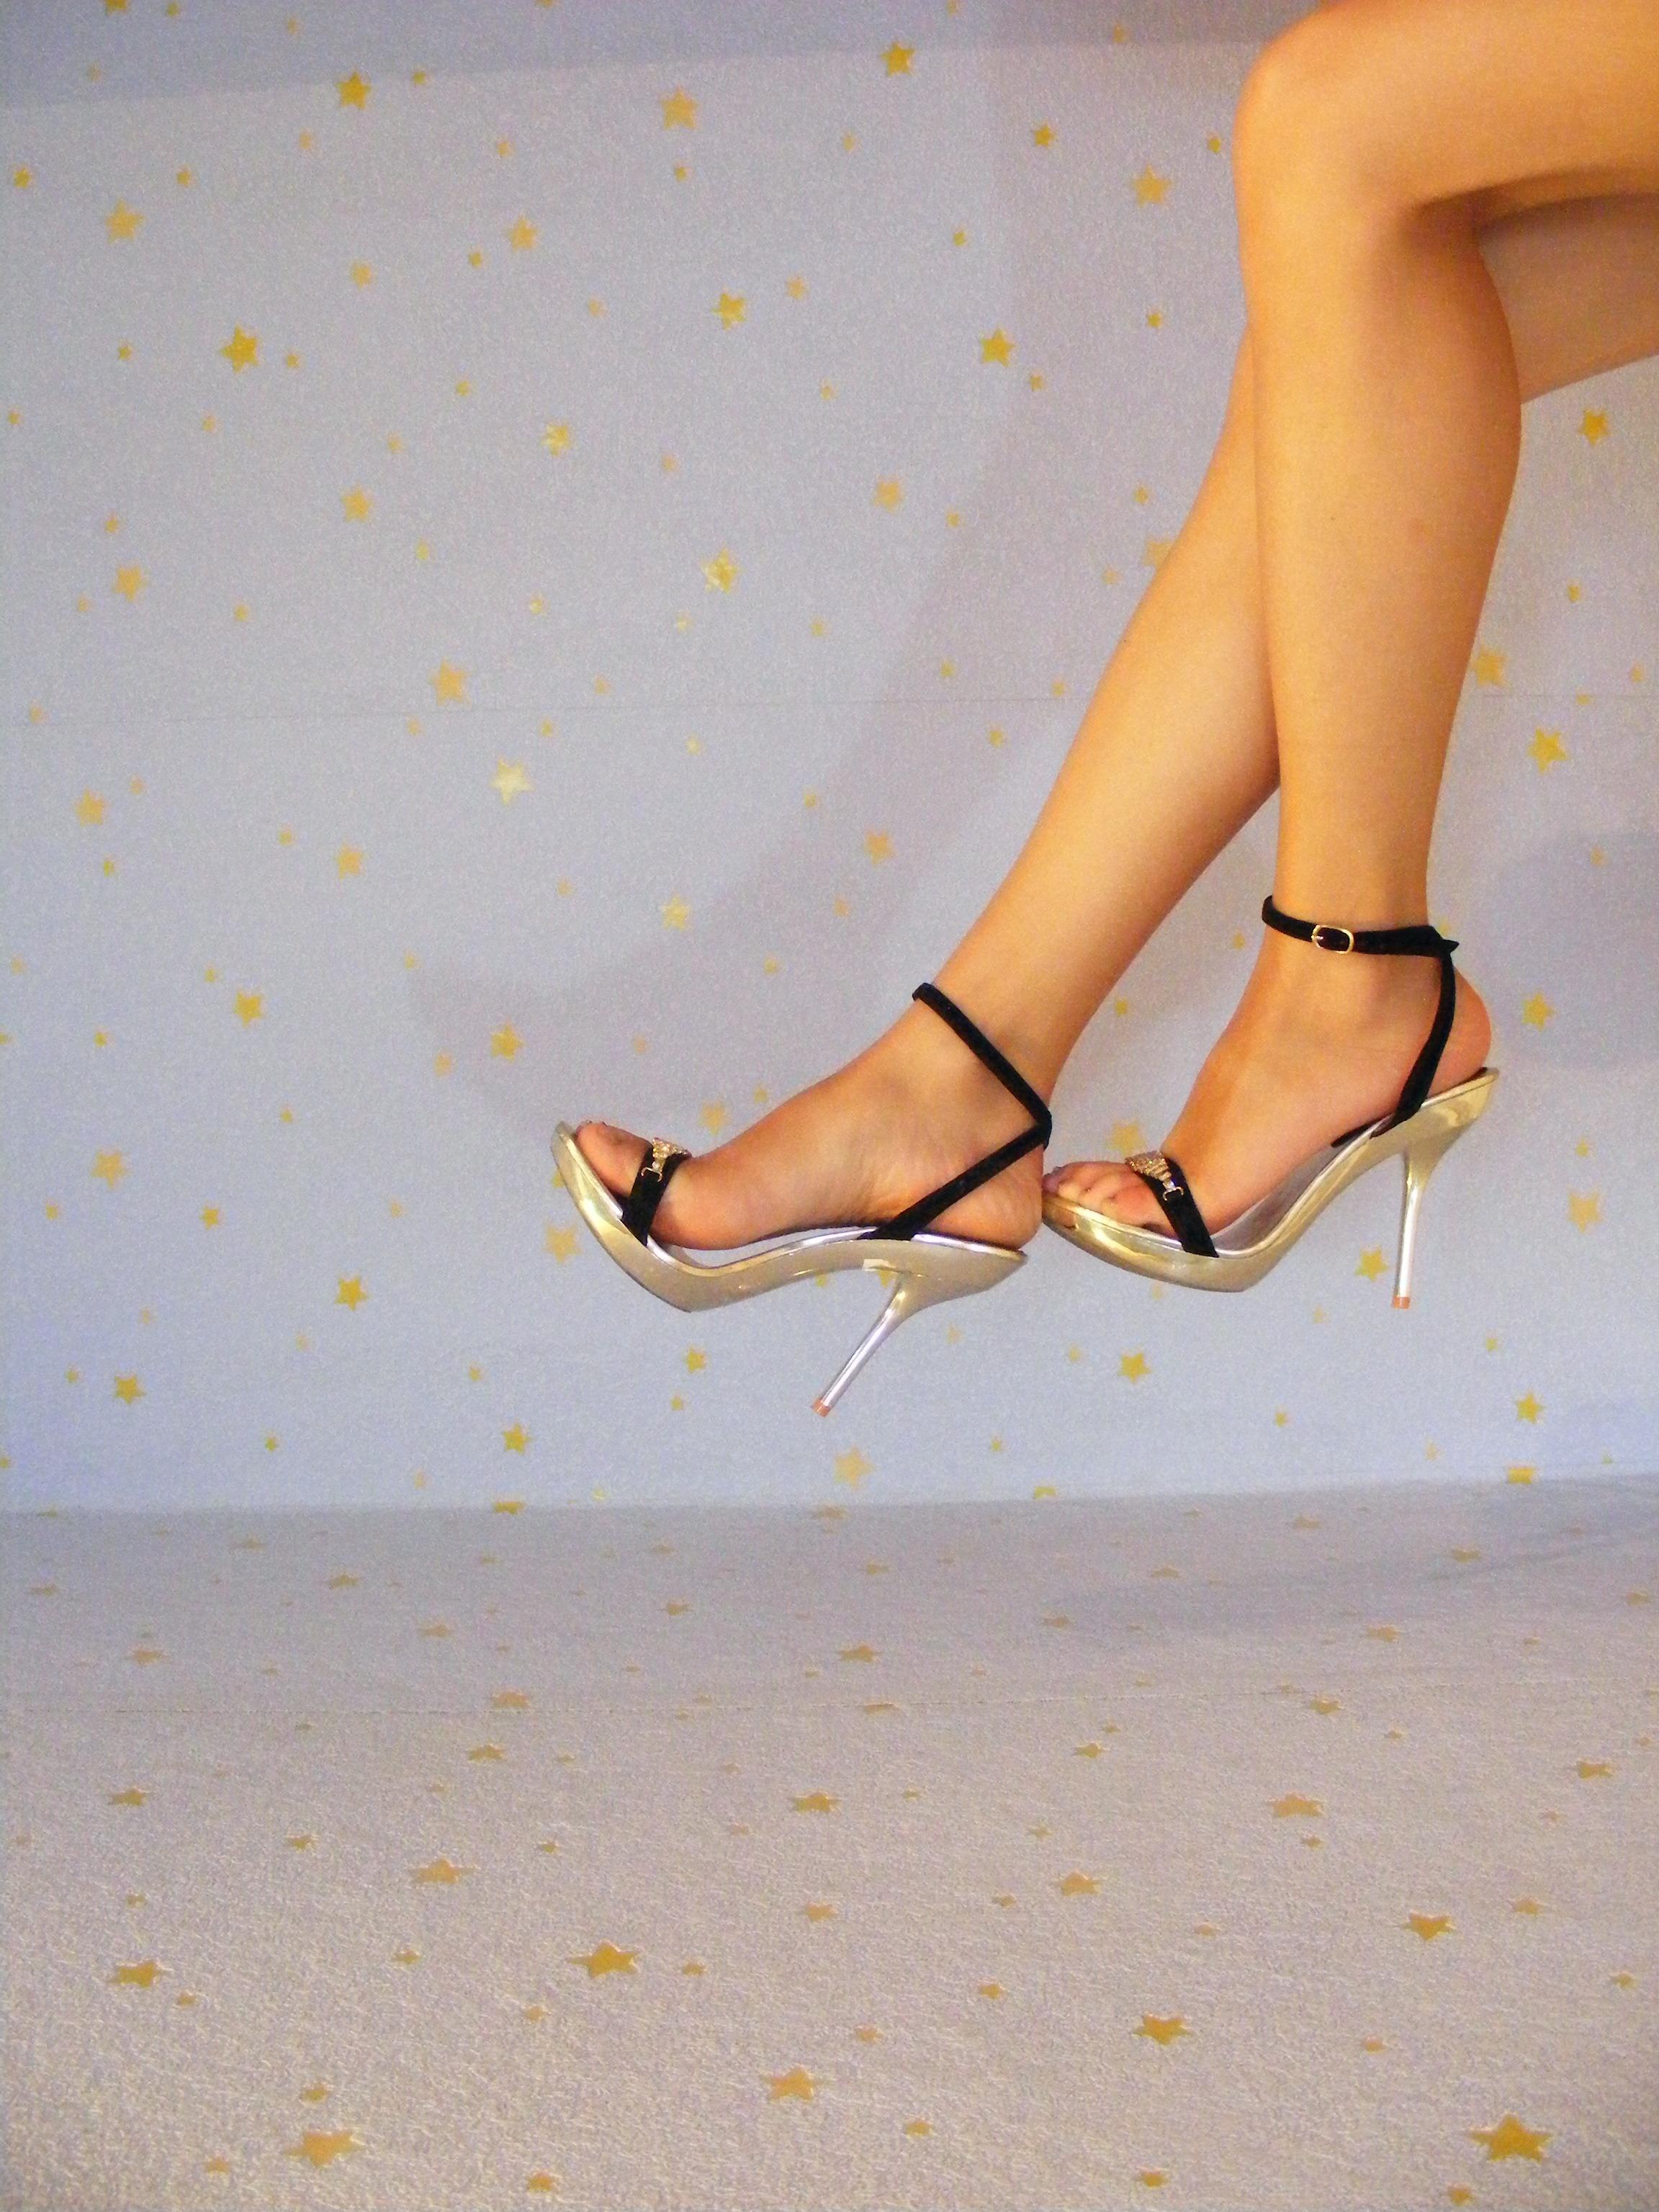 Featured ultra sexy high heel stiletto shoe photographs